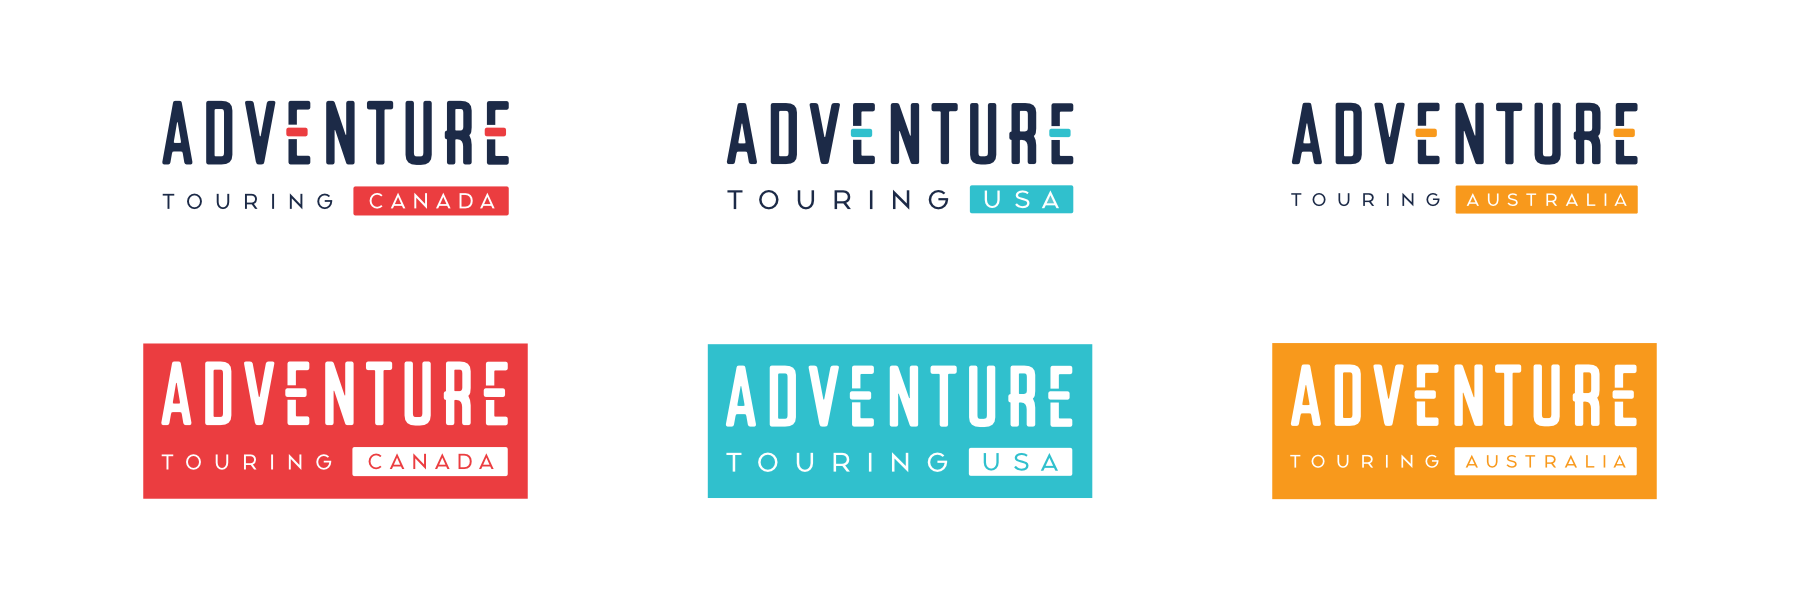 All three Adventure Touring Location Logos